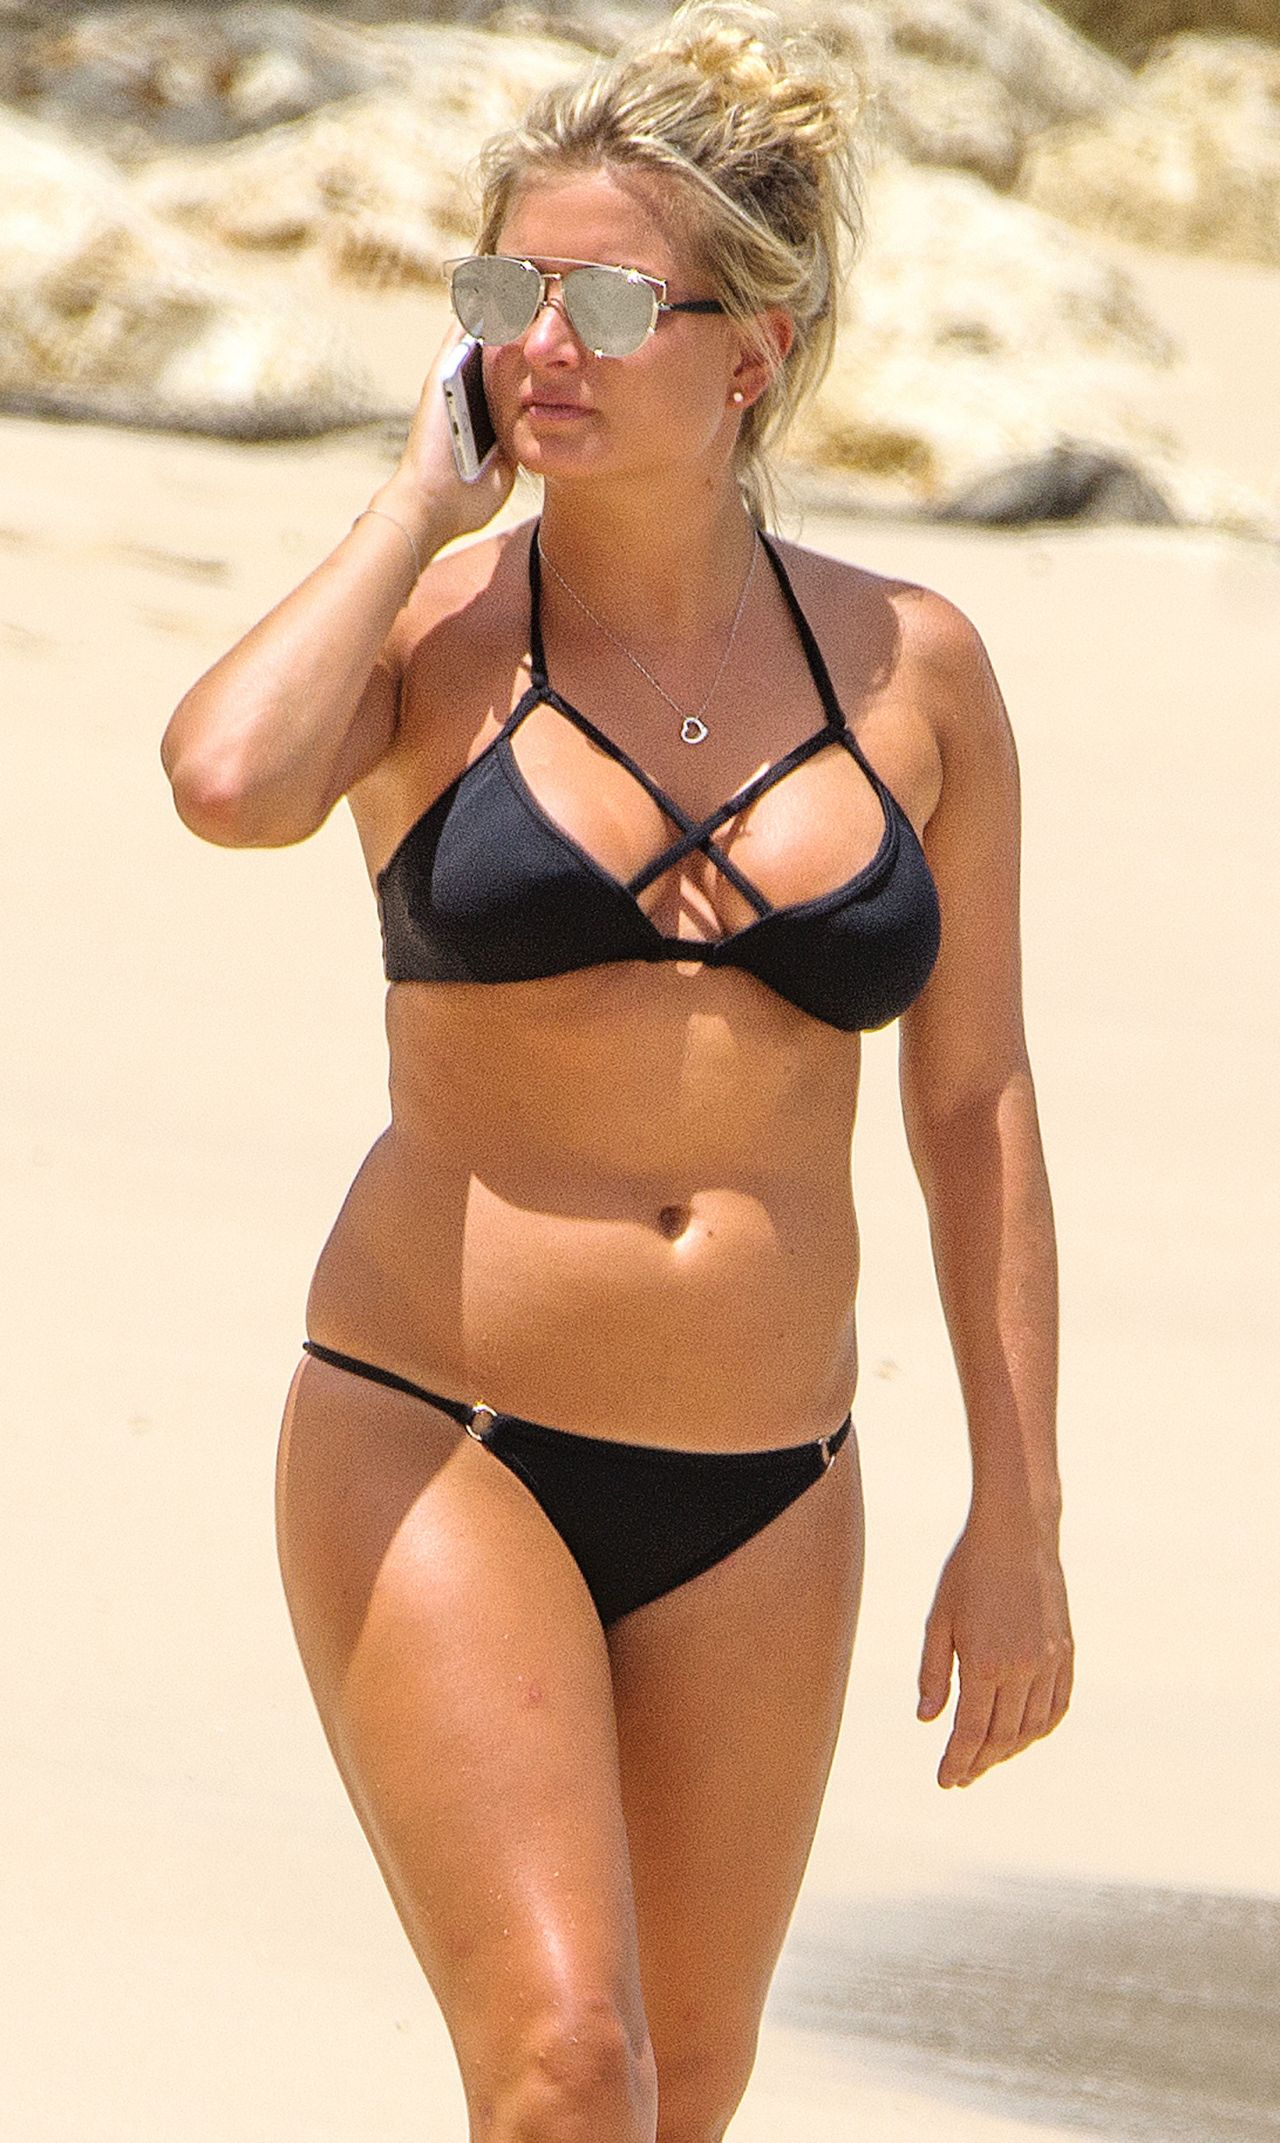 Zara Holland Hot in Bikini - Beach in Barbados 8/8/2016